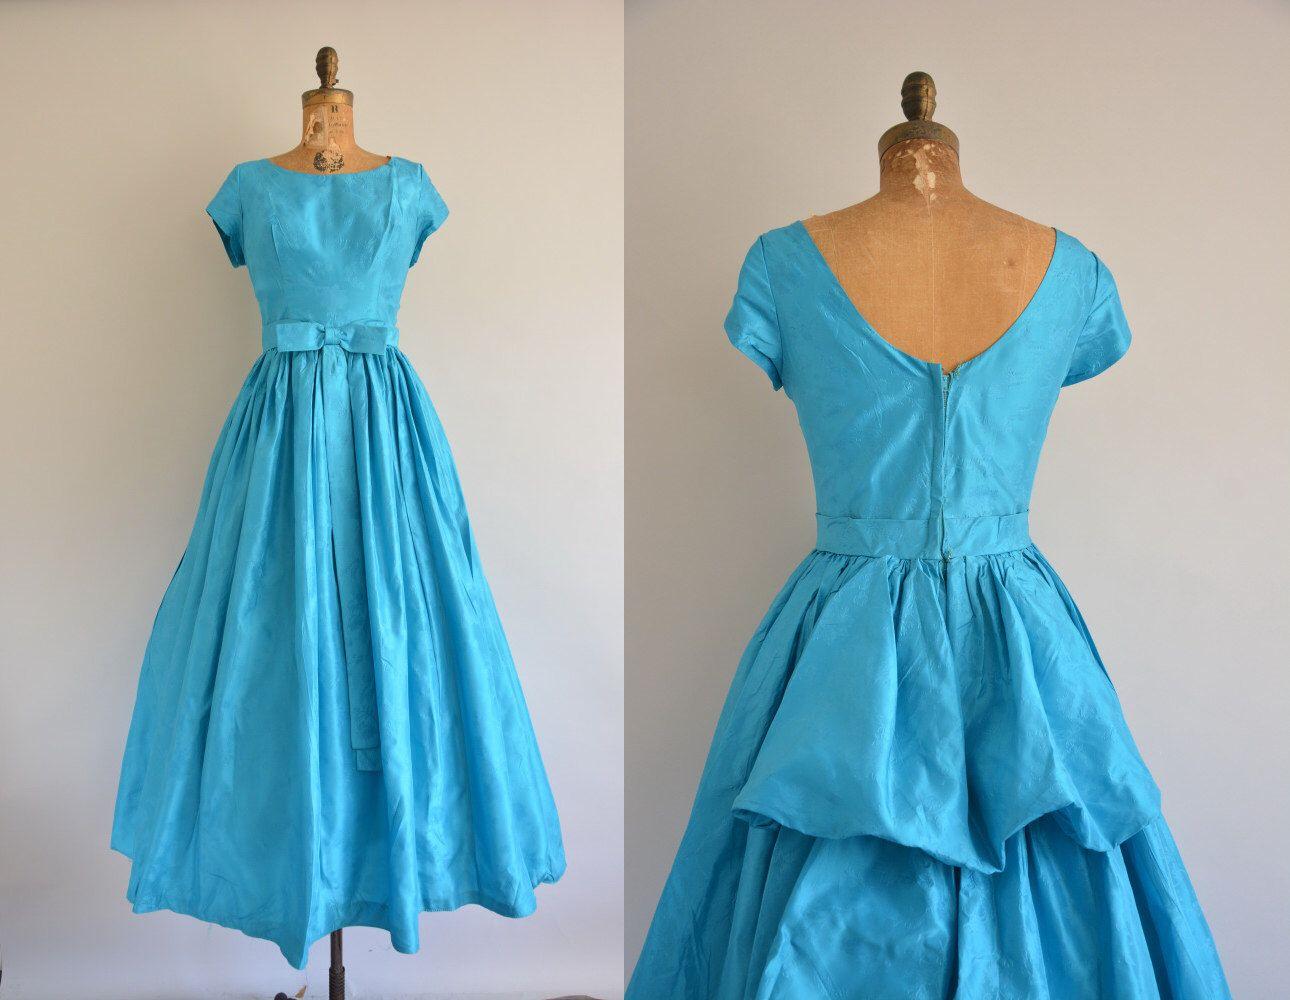 S prom dress s teal bustle prom dress vintage s dress